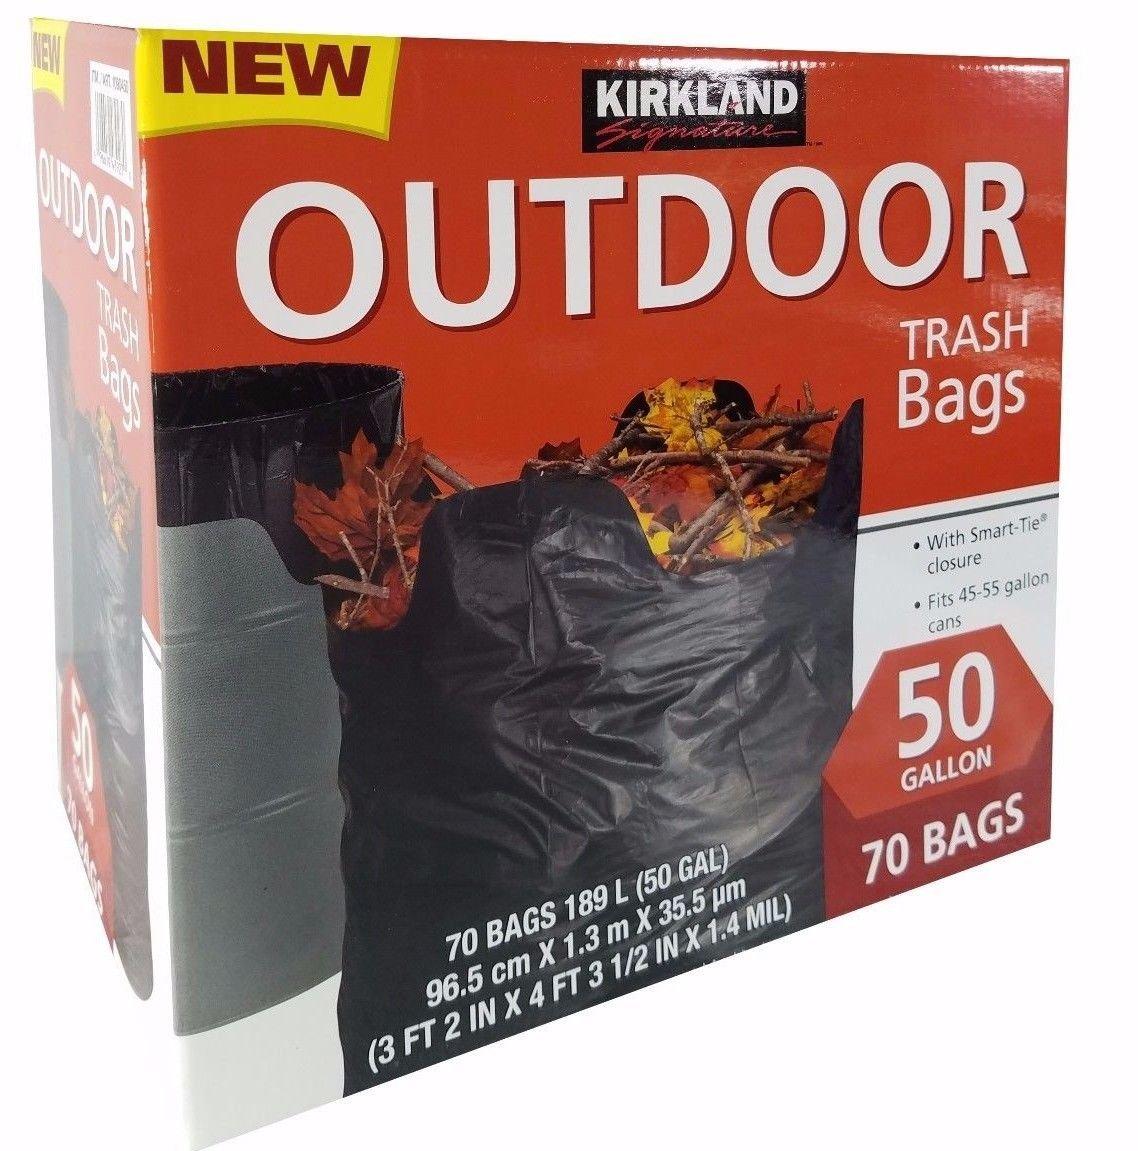 Kirkland Signature Outdoor 50 gallon Trash Bags (70 Pack) by Kirkland Signature